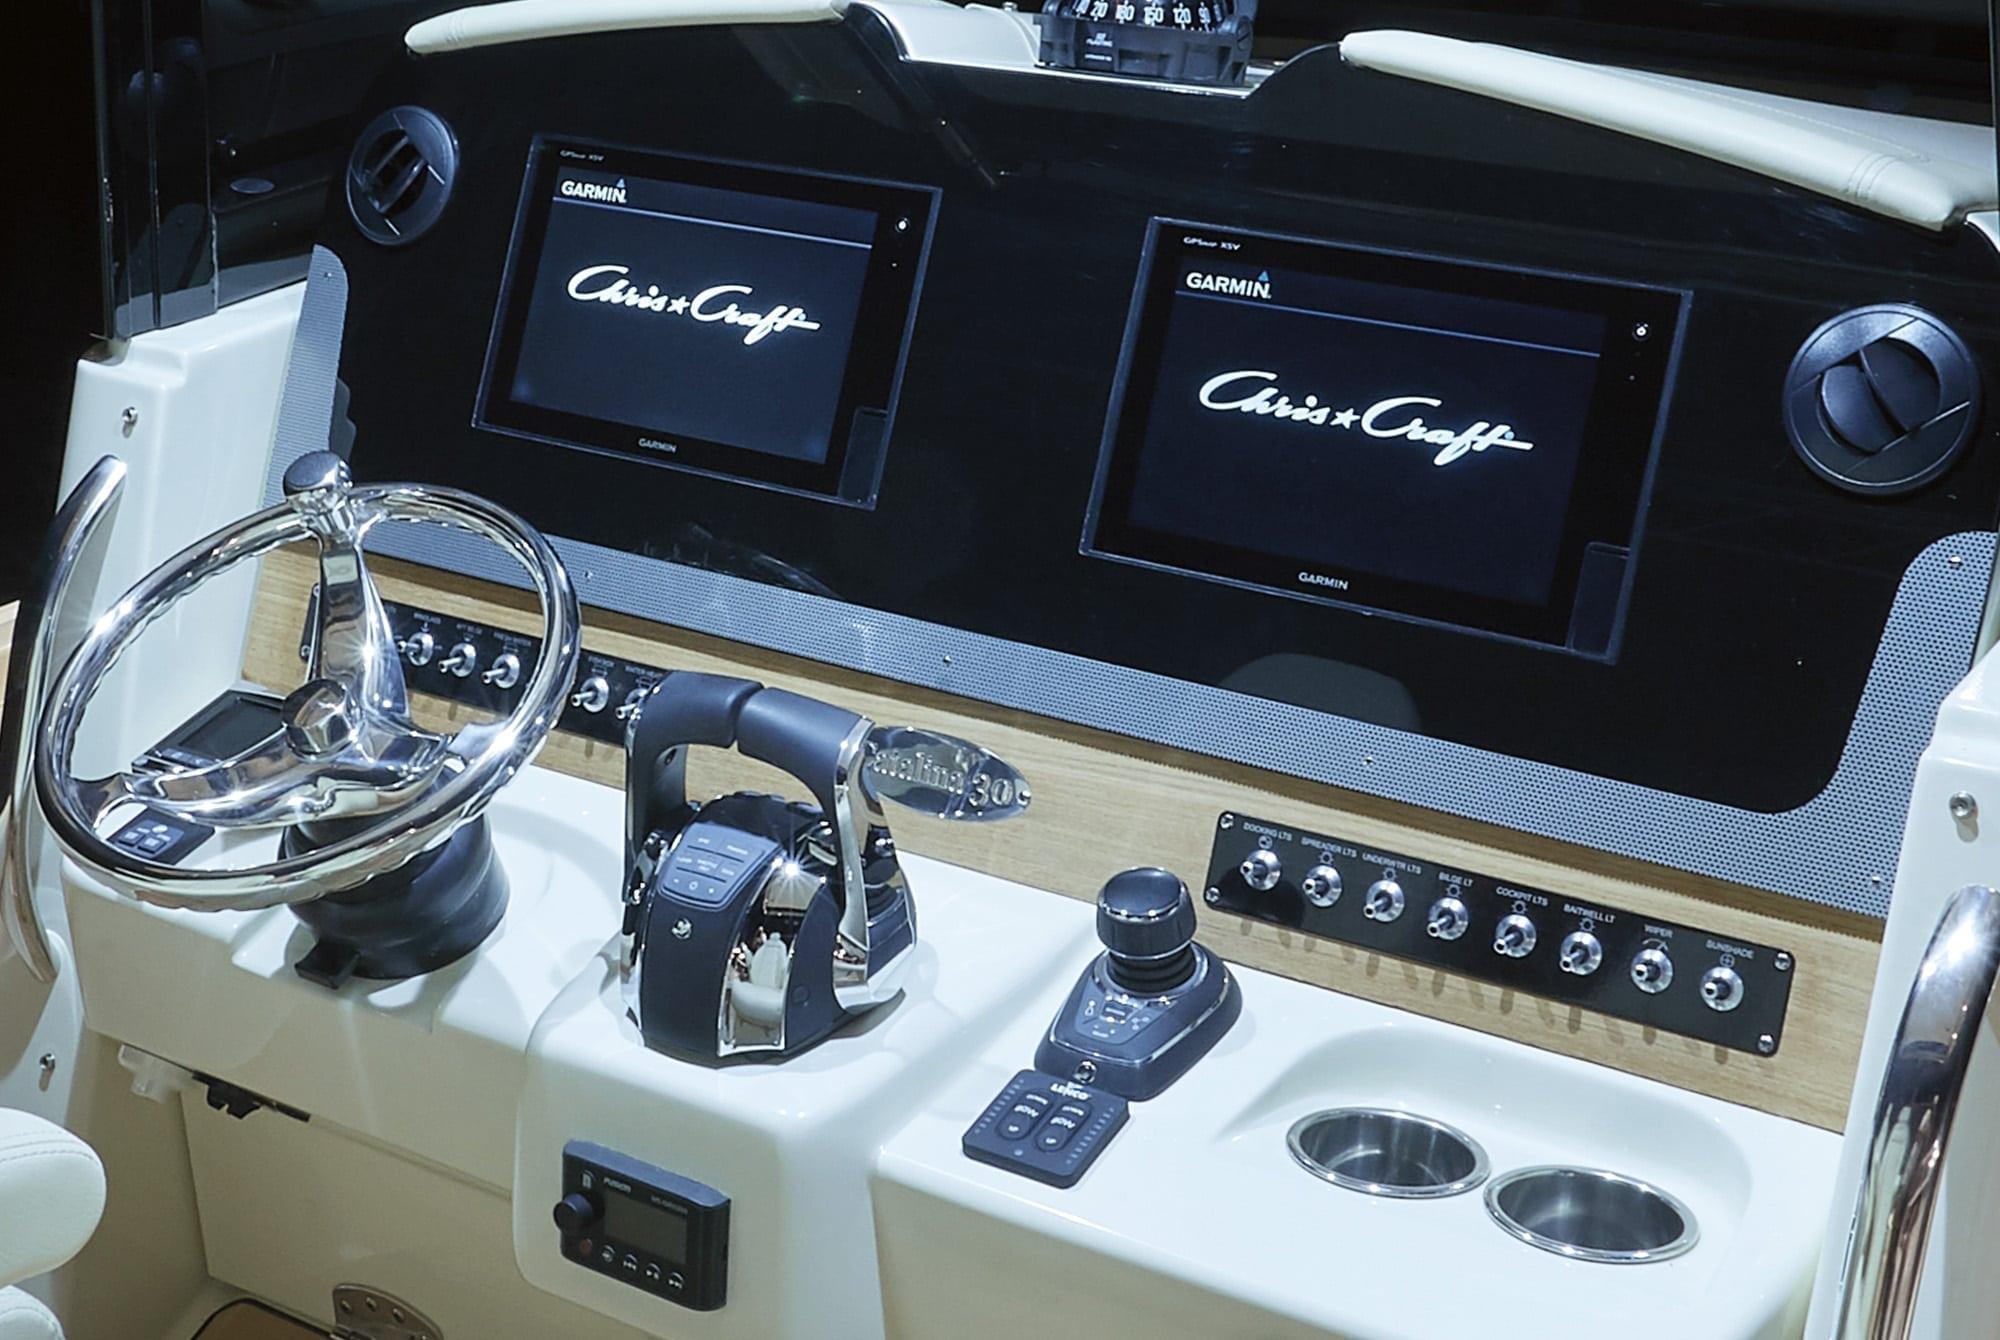 Chris Craft Catalina 29 Cockpit and Digital Gauges